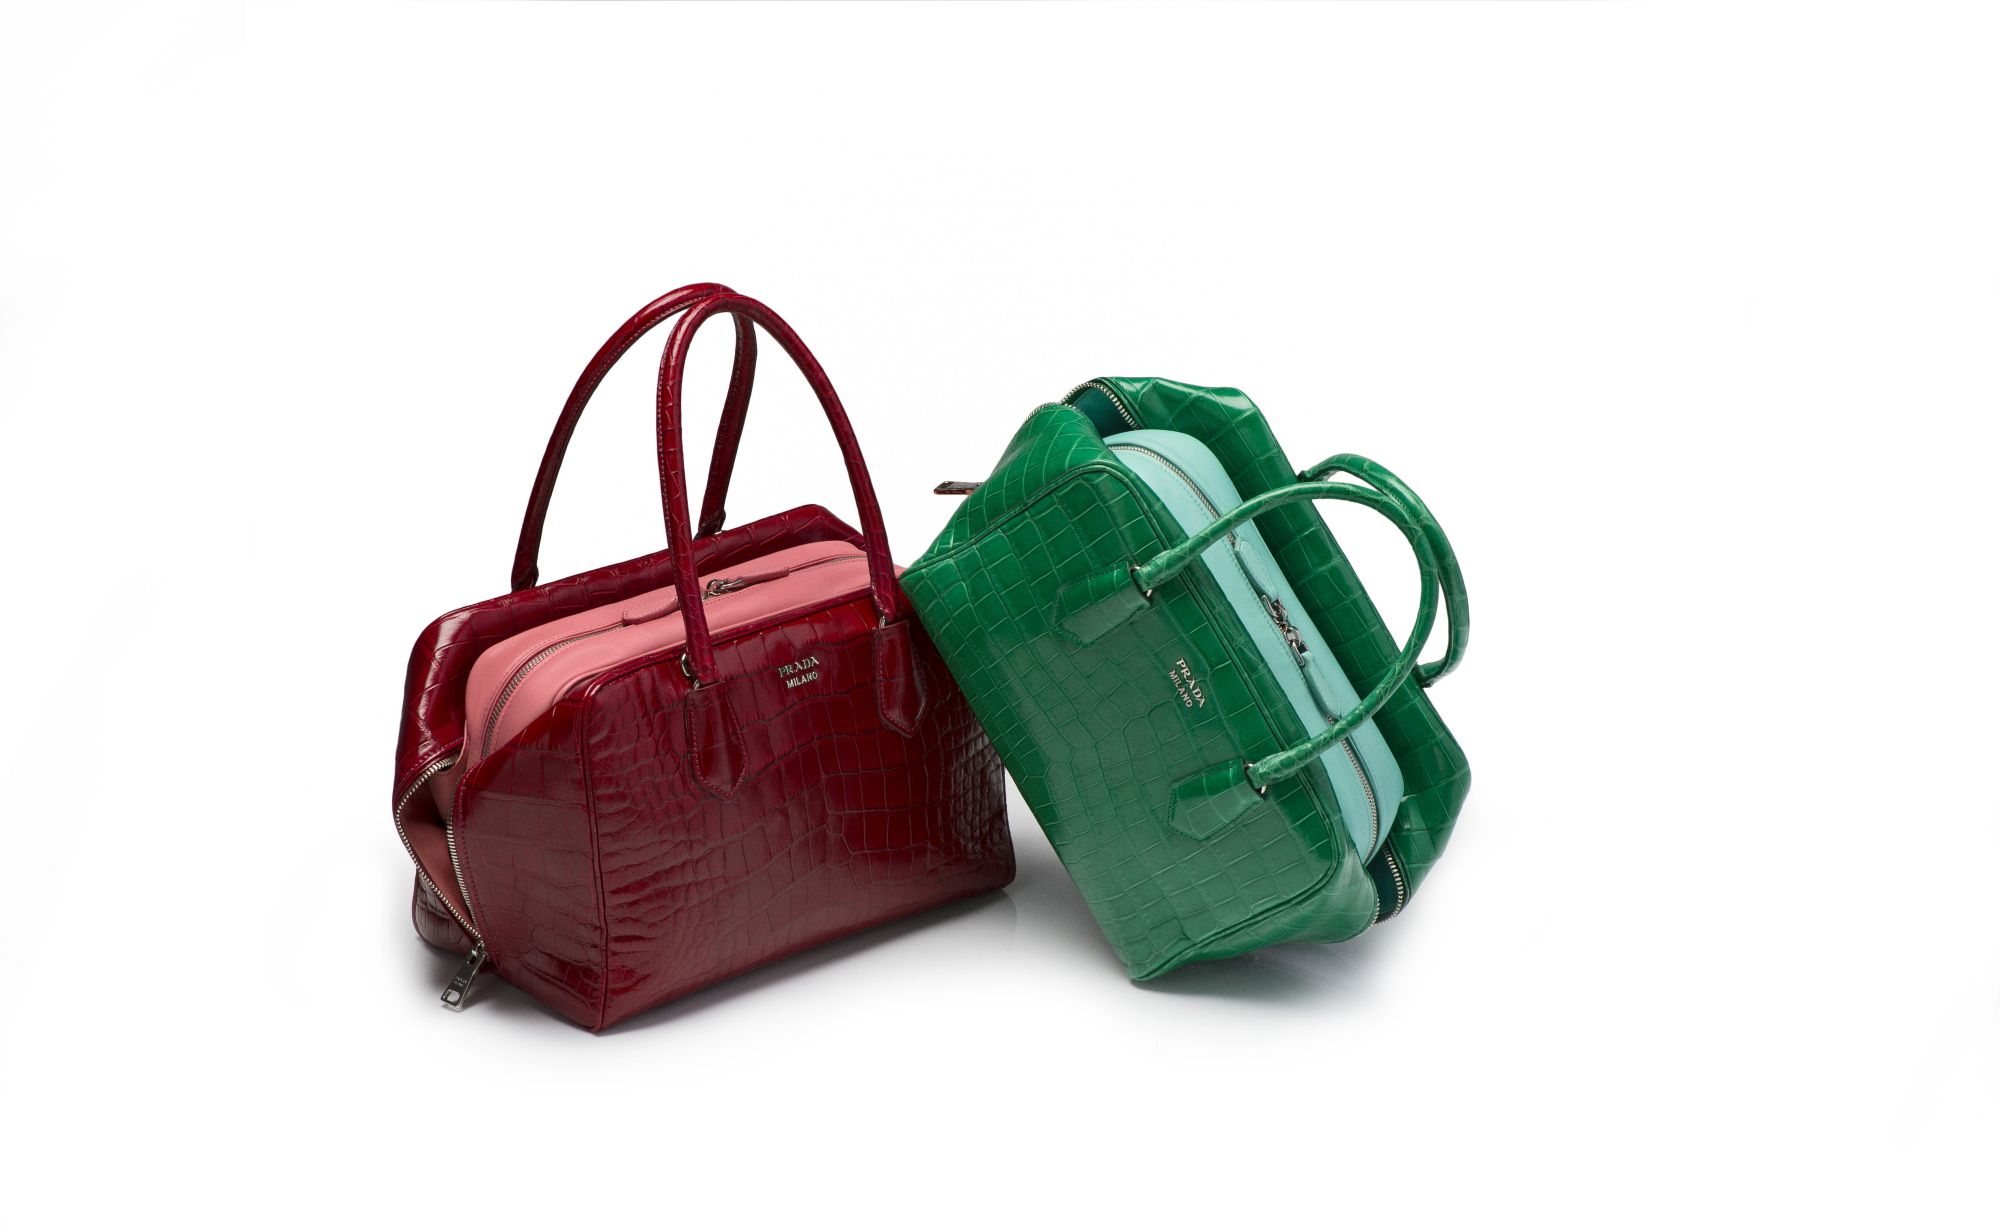 Introducing Prada's 'Inside' Bag